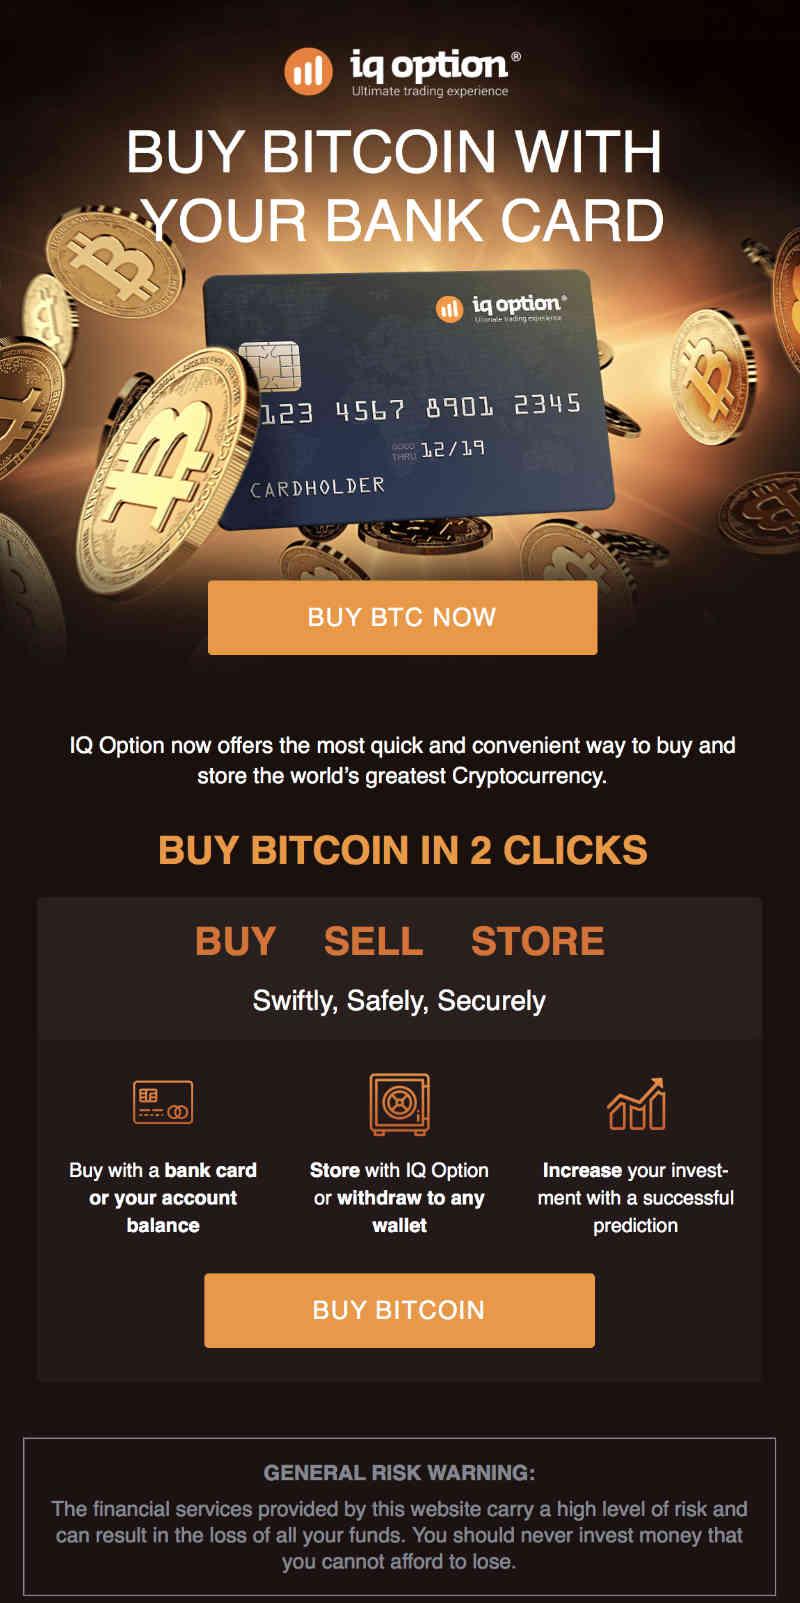 devizni depozit za trgovanje valutama bitcoin zaraditi novac osim rudarstva bitcoina